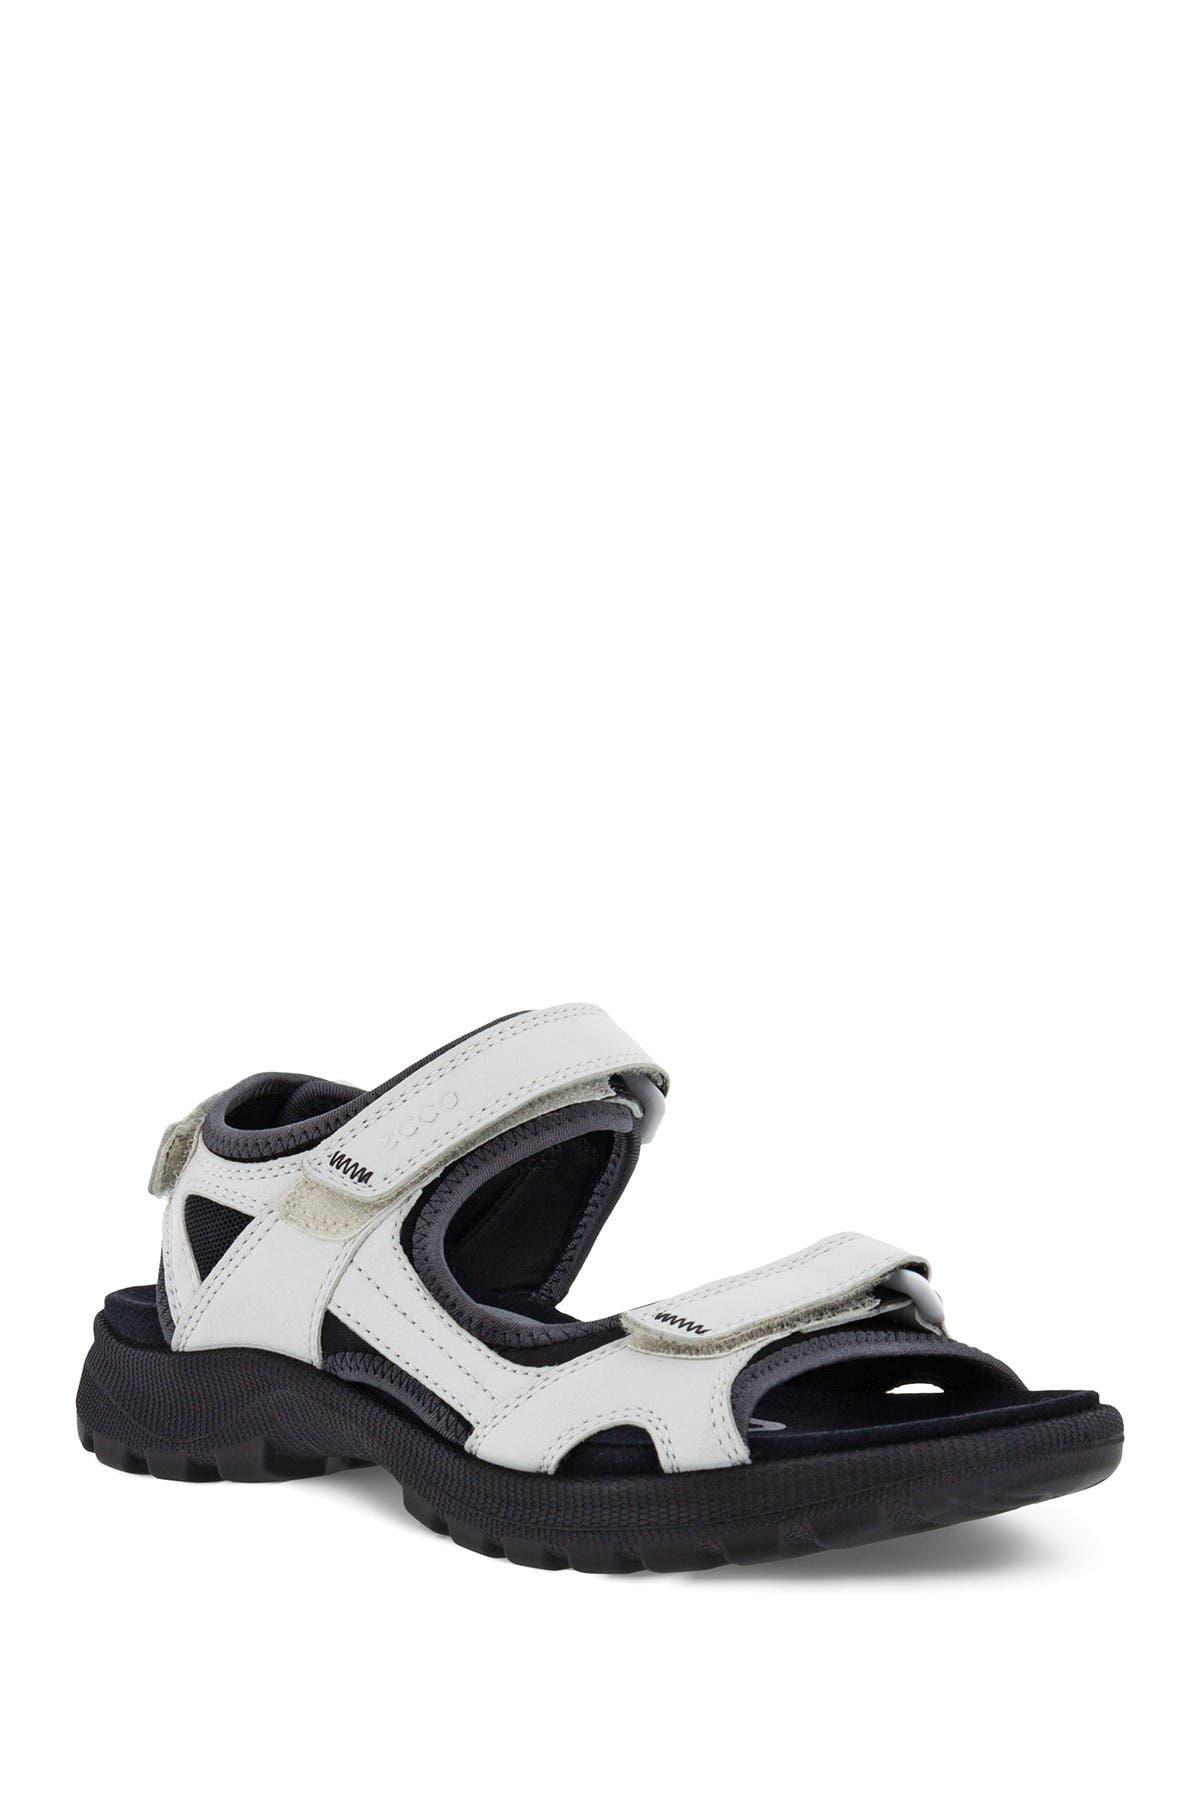 Ecco Sandals ONROADS HOOK-AND-LOOP SANDAL